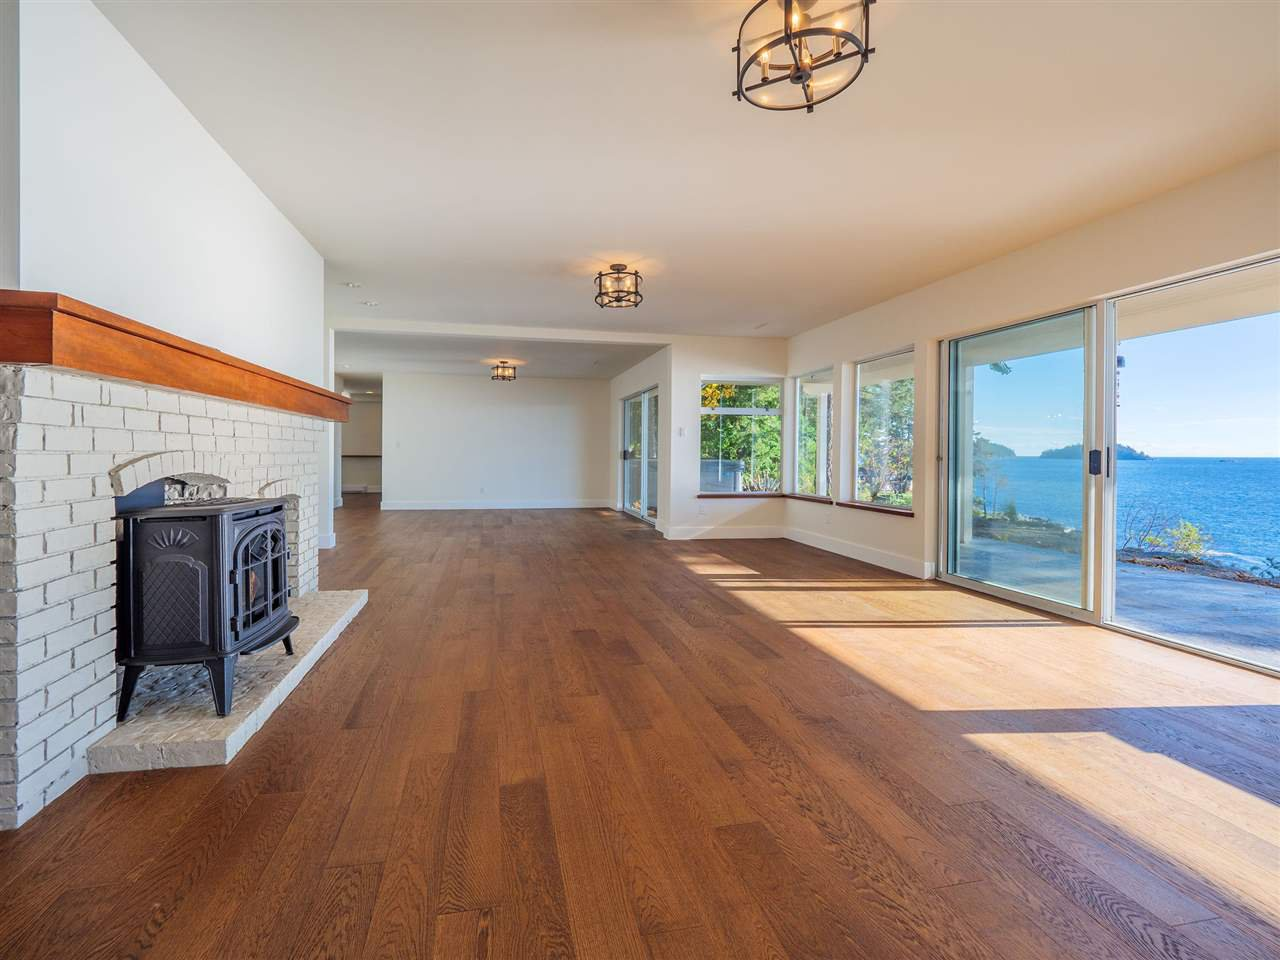 "Photo 31: Photos: 7101 DALE Road in Sechelt: Sechelt District House for sale in ""Caleda Estates"" (Sunshine Coast)  : MLS®# R2515160"